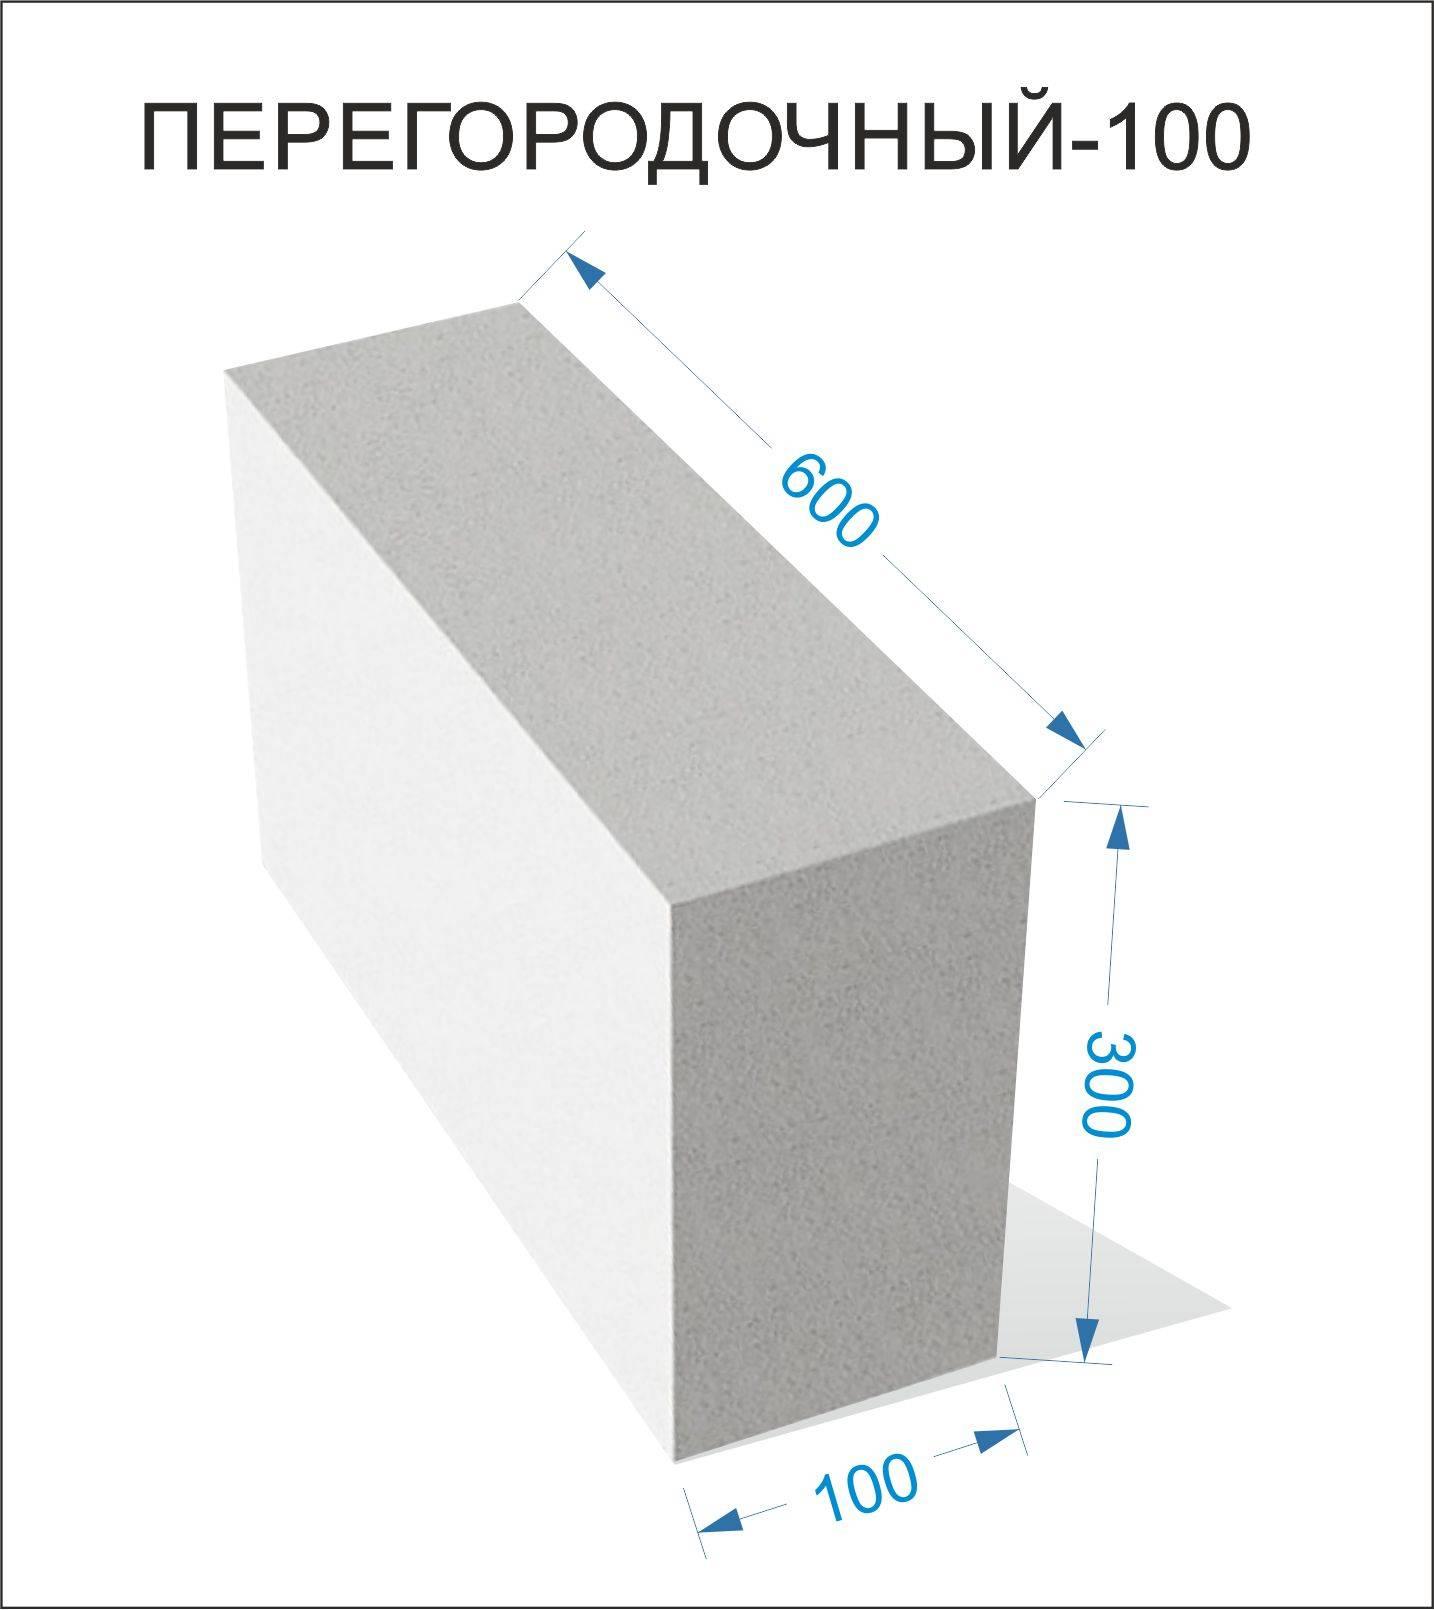 Пенобетон гост: 31360 2007, пенобетонные блоки